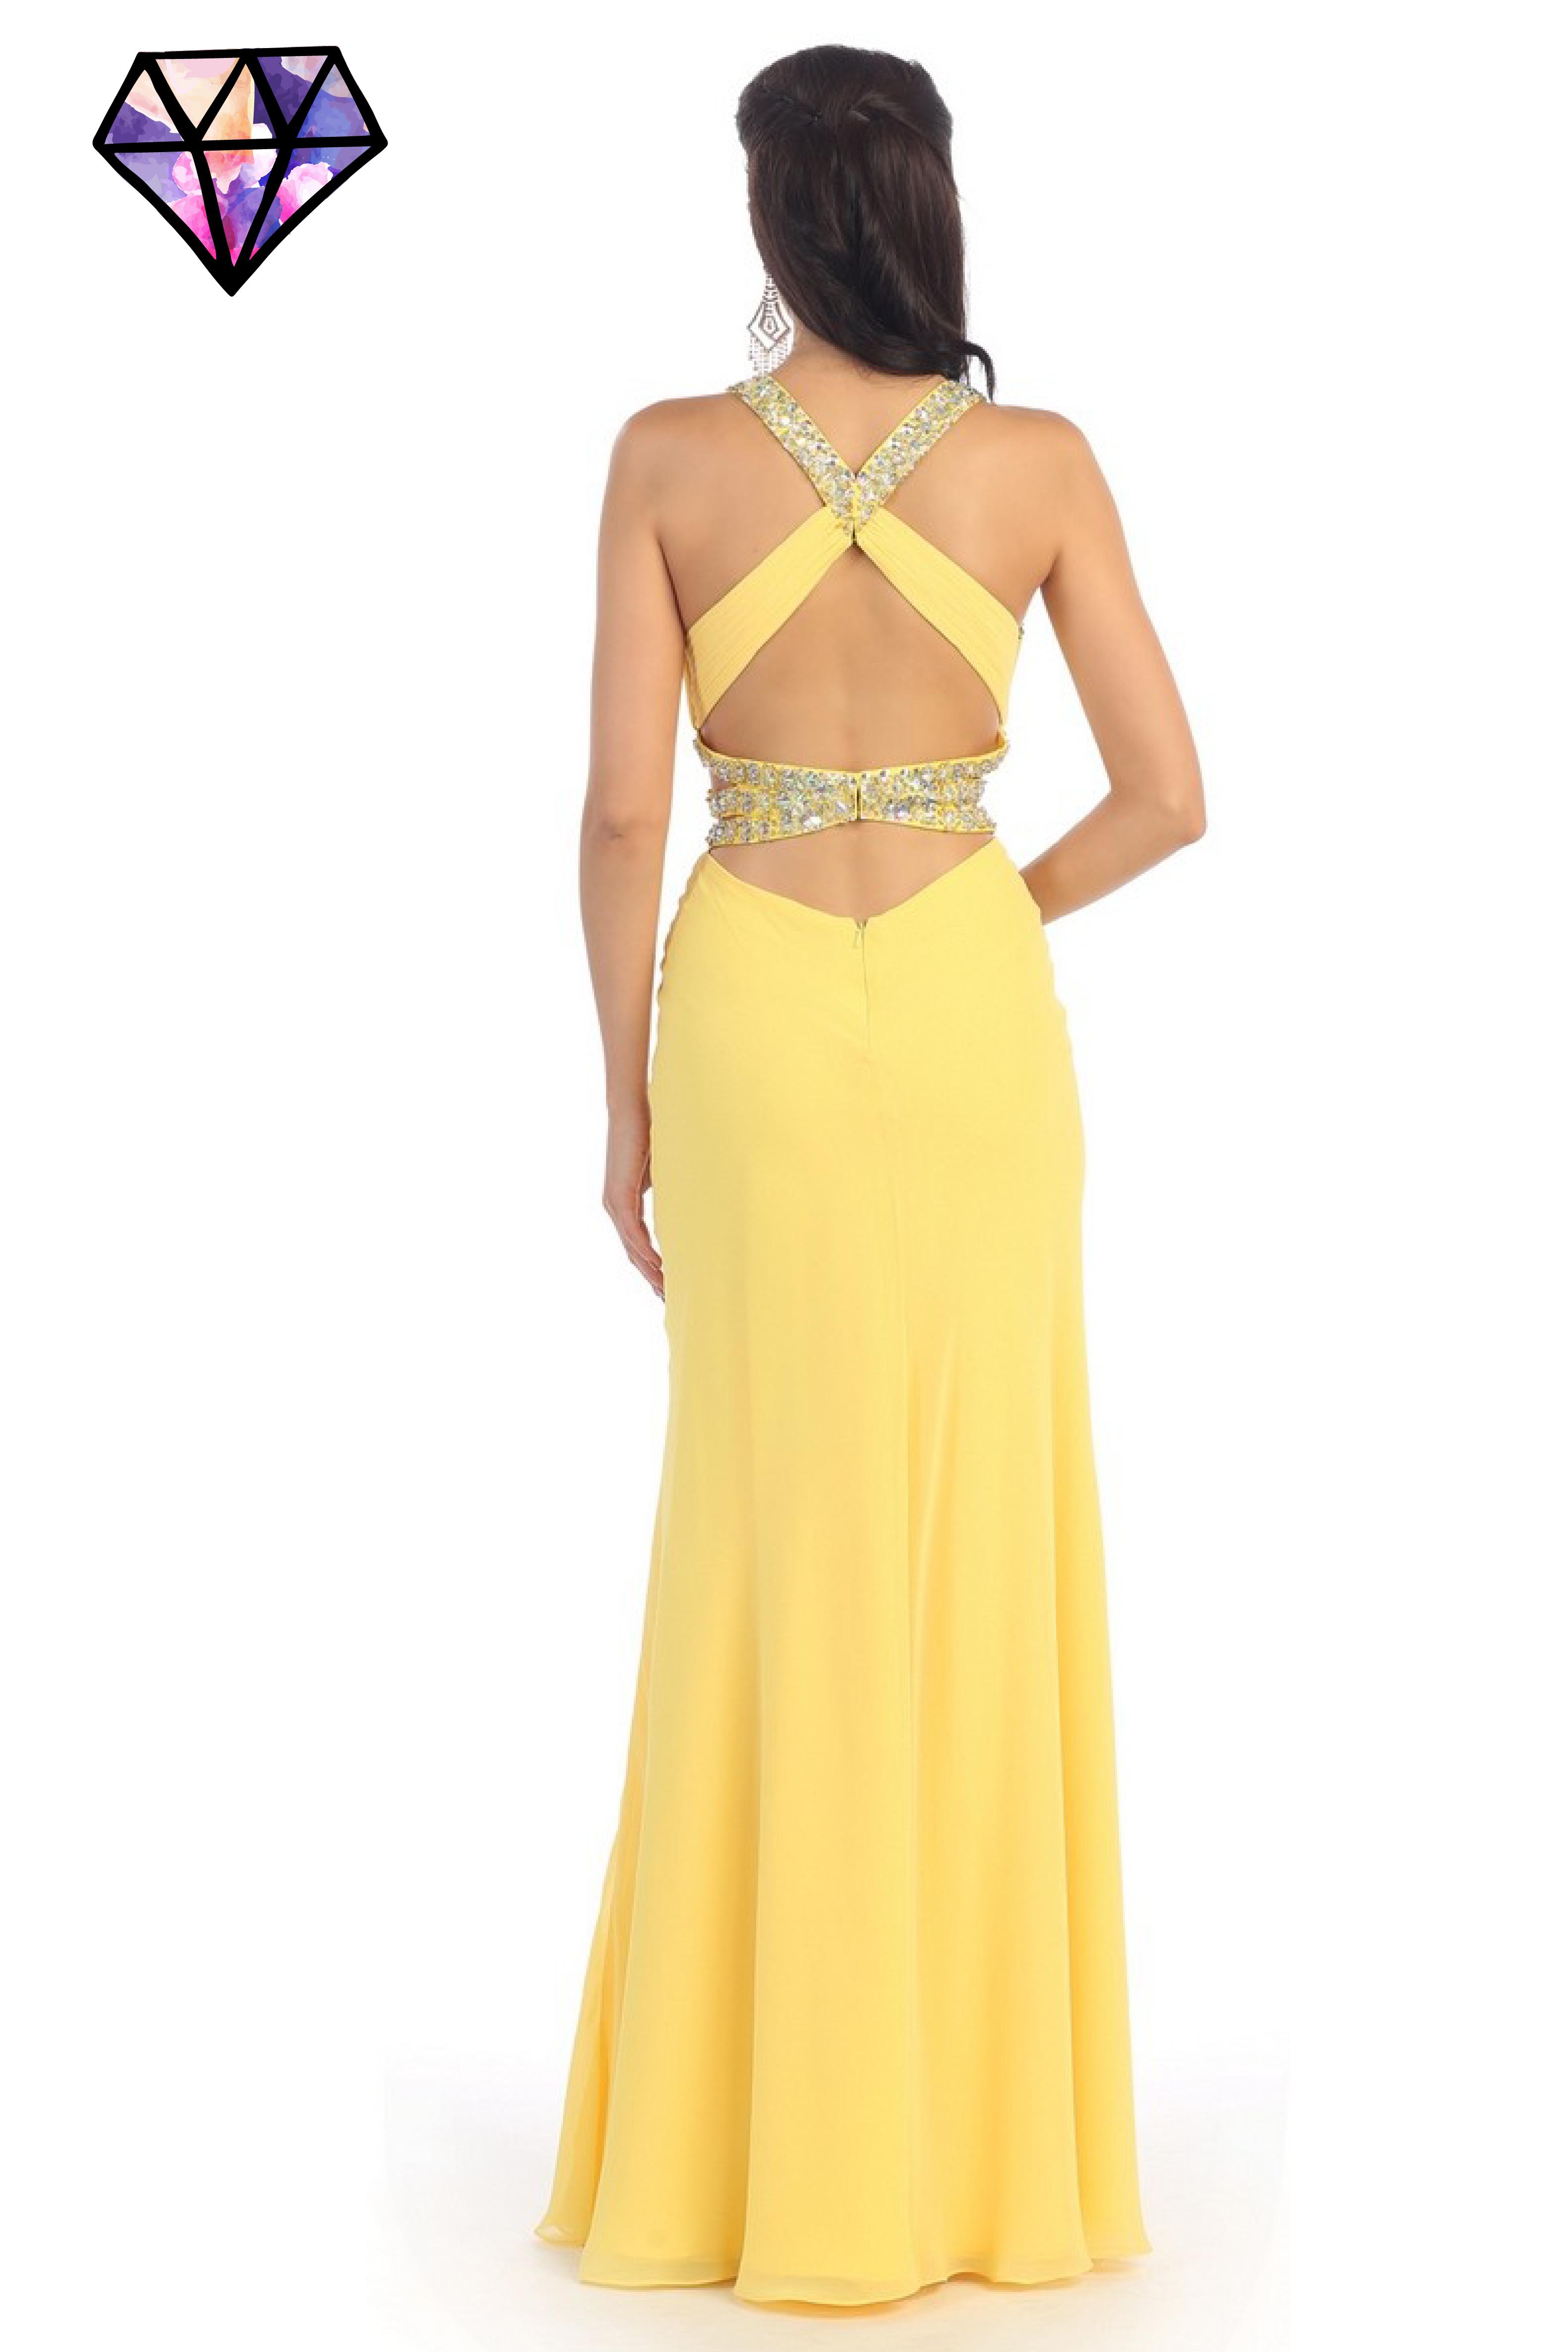 Www Fb Com Ragsacotty Fiesta Vestido Graduacion Boda Vestidos Strapless Dress Formal Backless Dress Formal Dresses [ 4746 x 3164 Pixel ]